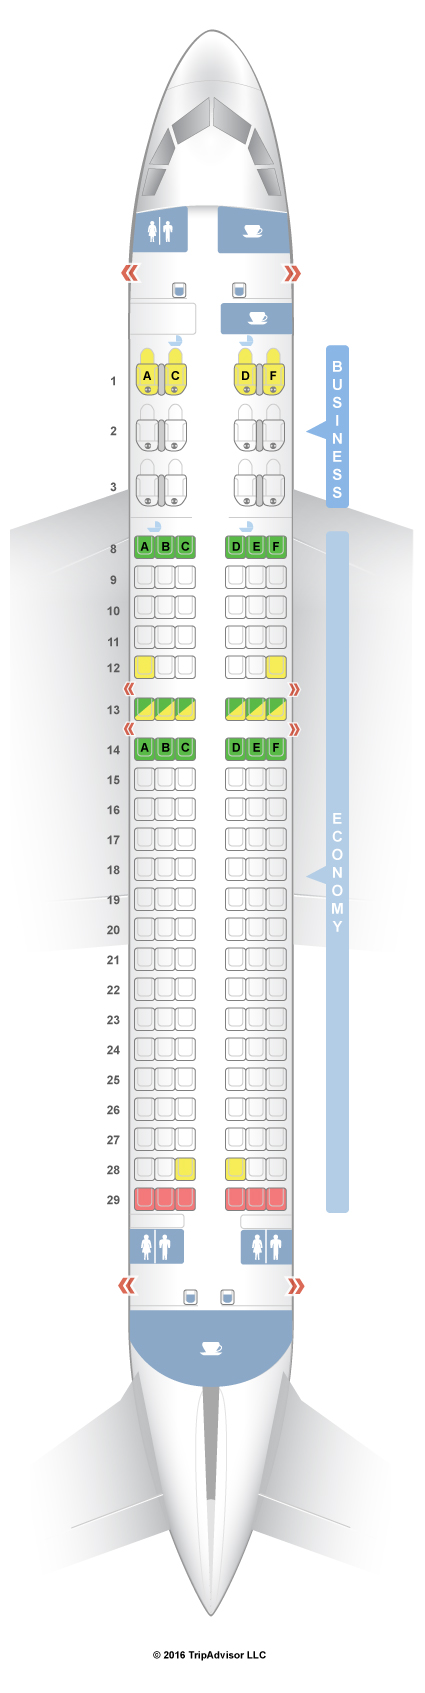 Seatguru Seat Map Qatar Airways Airbus A320 320 V1